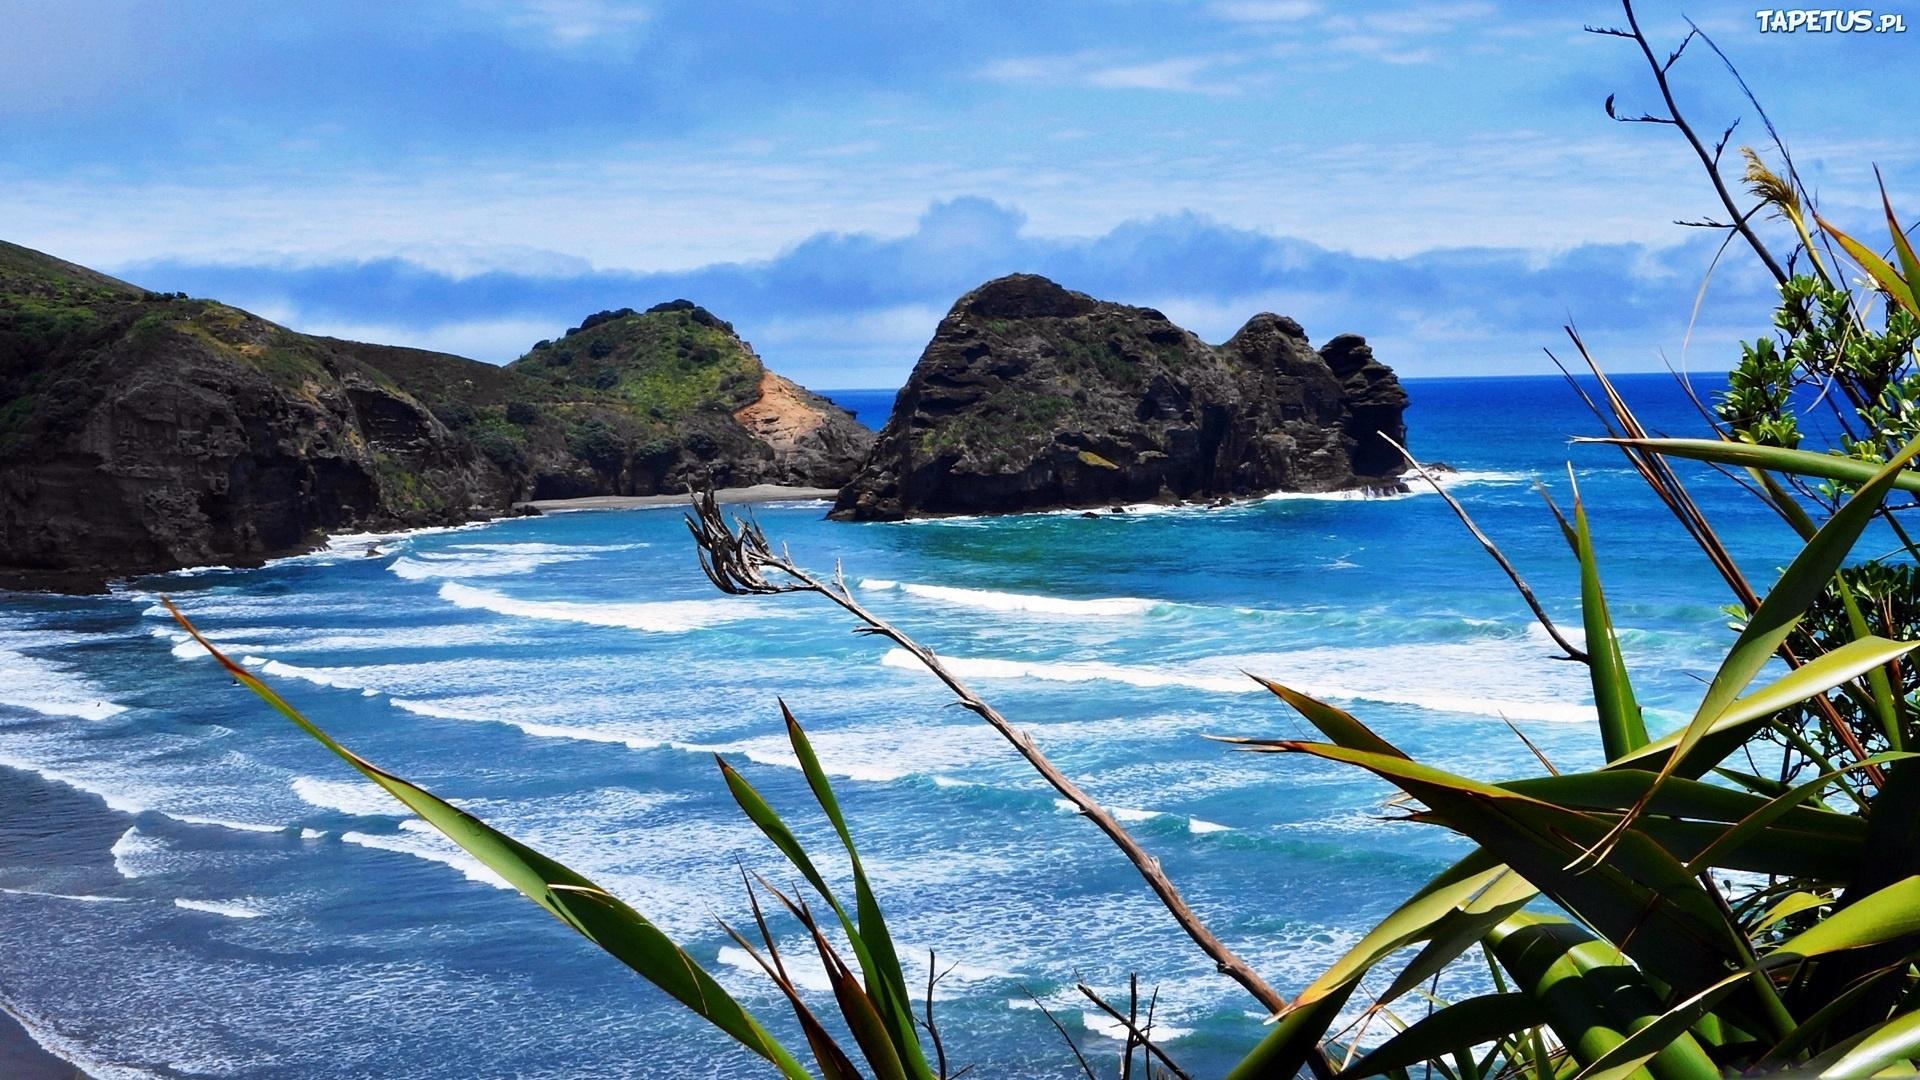 Bay of Islands, New Zealand  № 624993 бесплатно